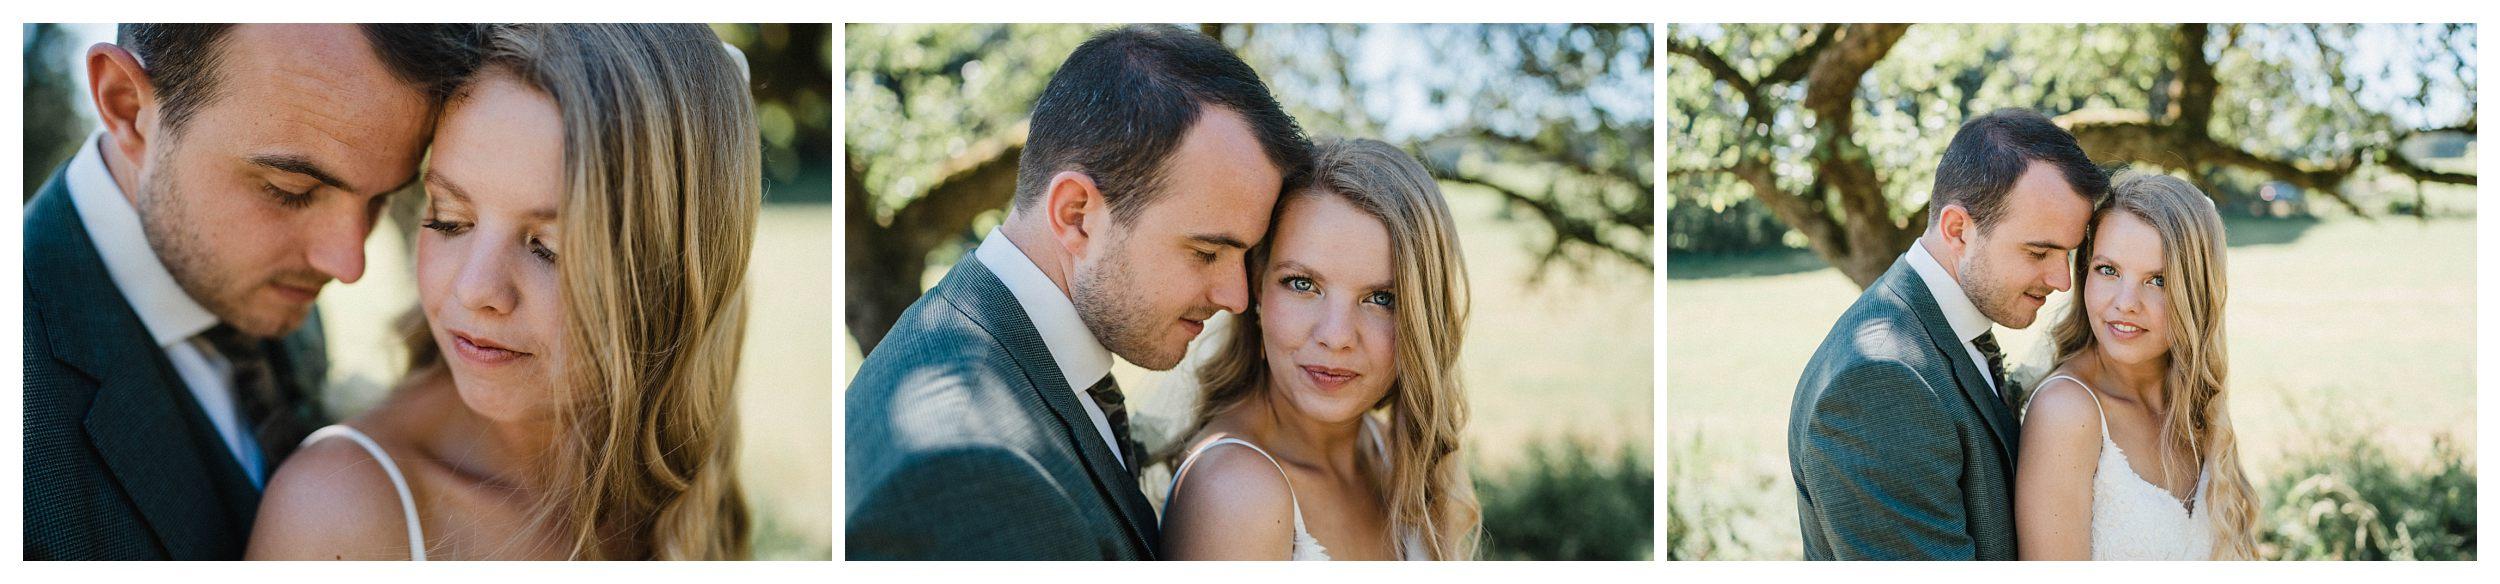 huwelijksfotograaf bruidsfotograaf destinationwedding huwelijksfotografie in ardennen nederland (41).jpg